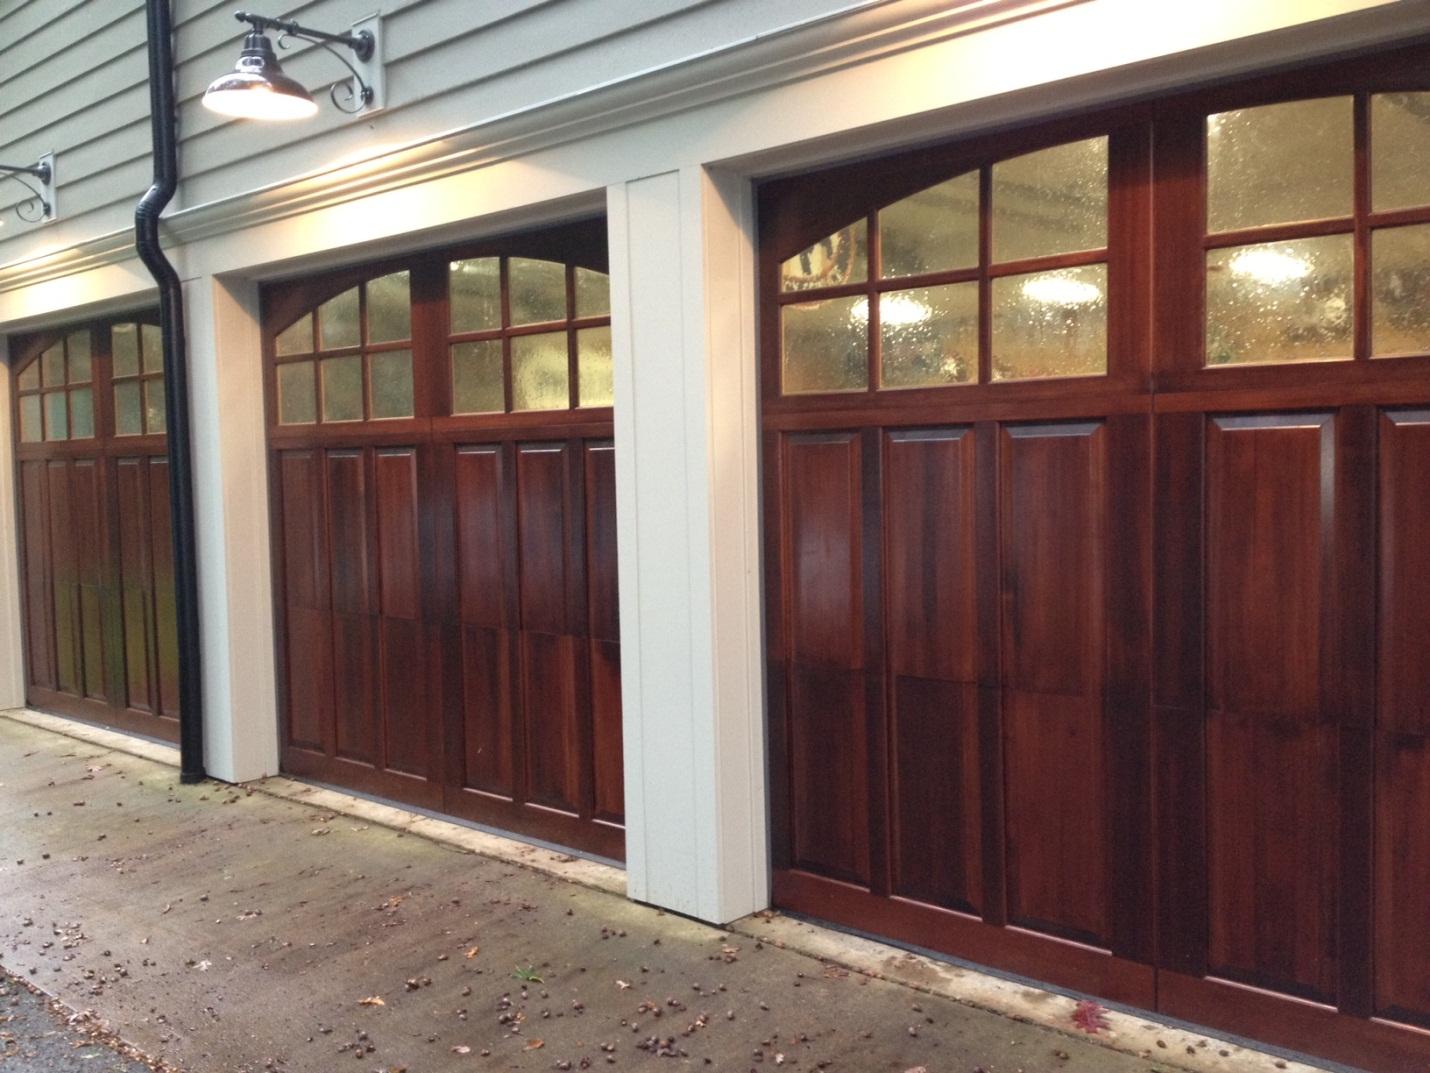 1073 #876B44 Car Garage Door With Hard Wood Plus Windows On Top And  Beautiful Wall